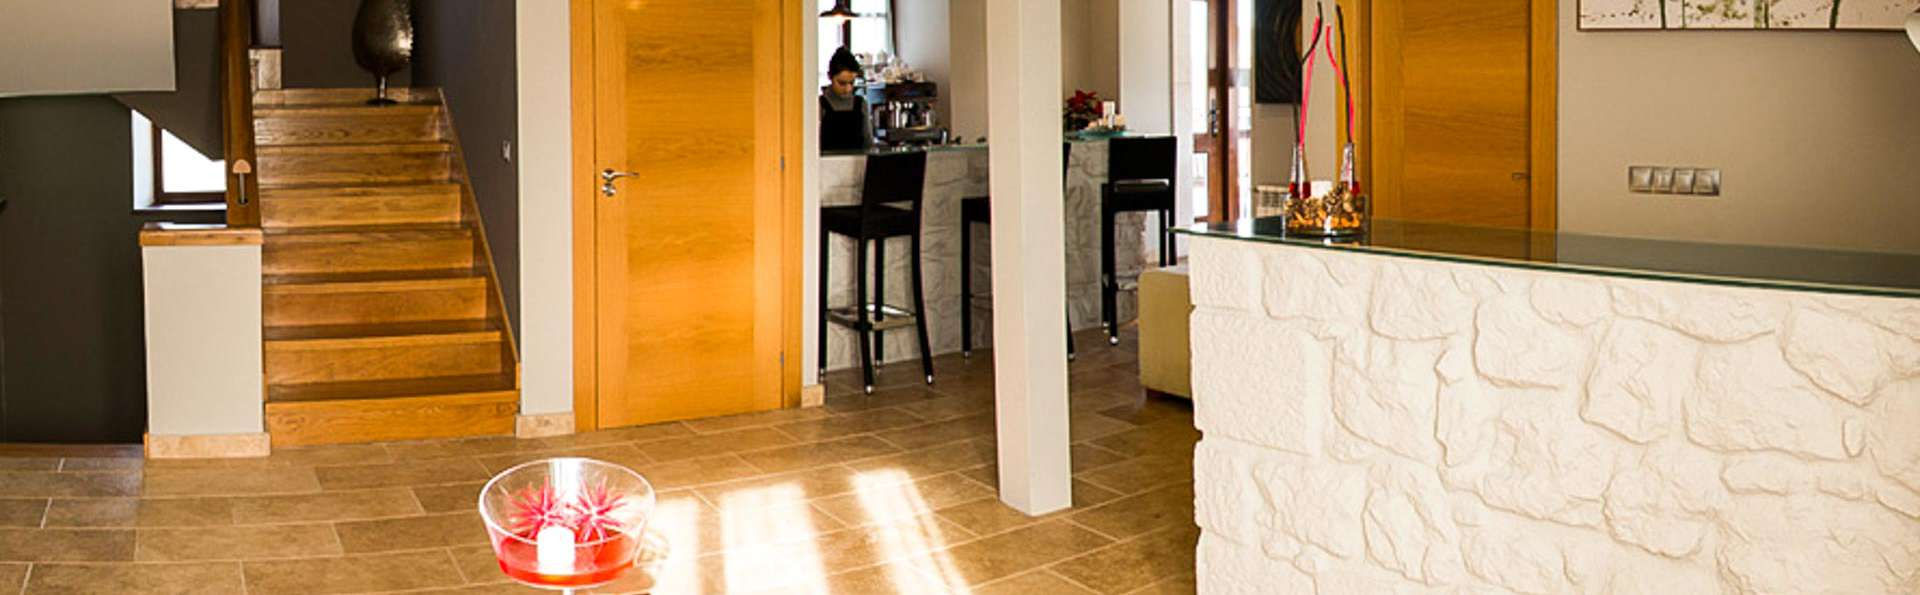 Hotel Villadesella - EDIT_LOBBY_01.jpg